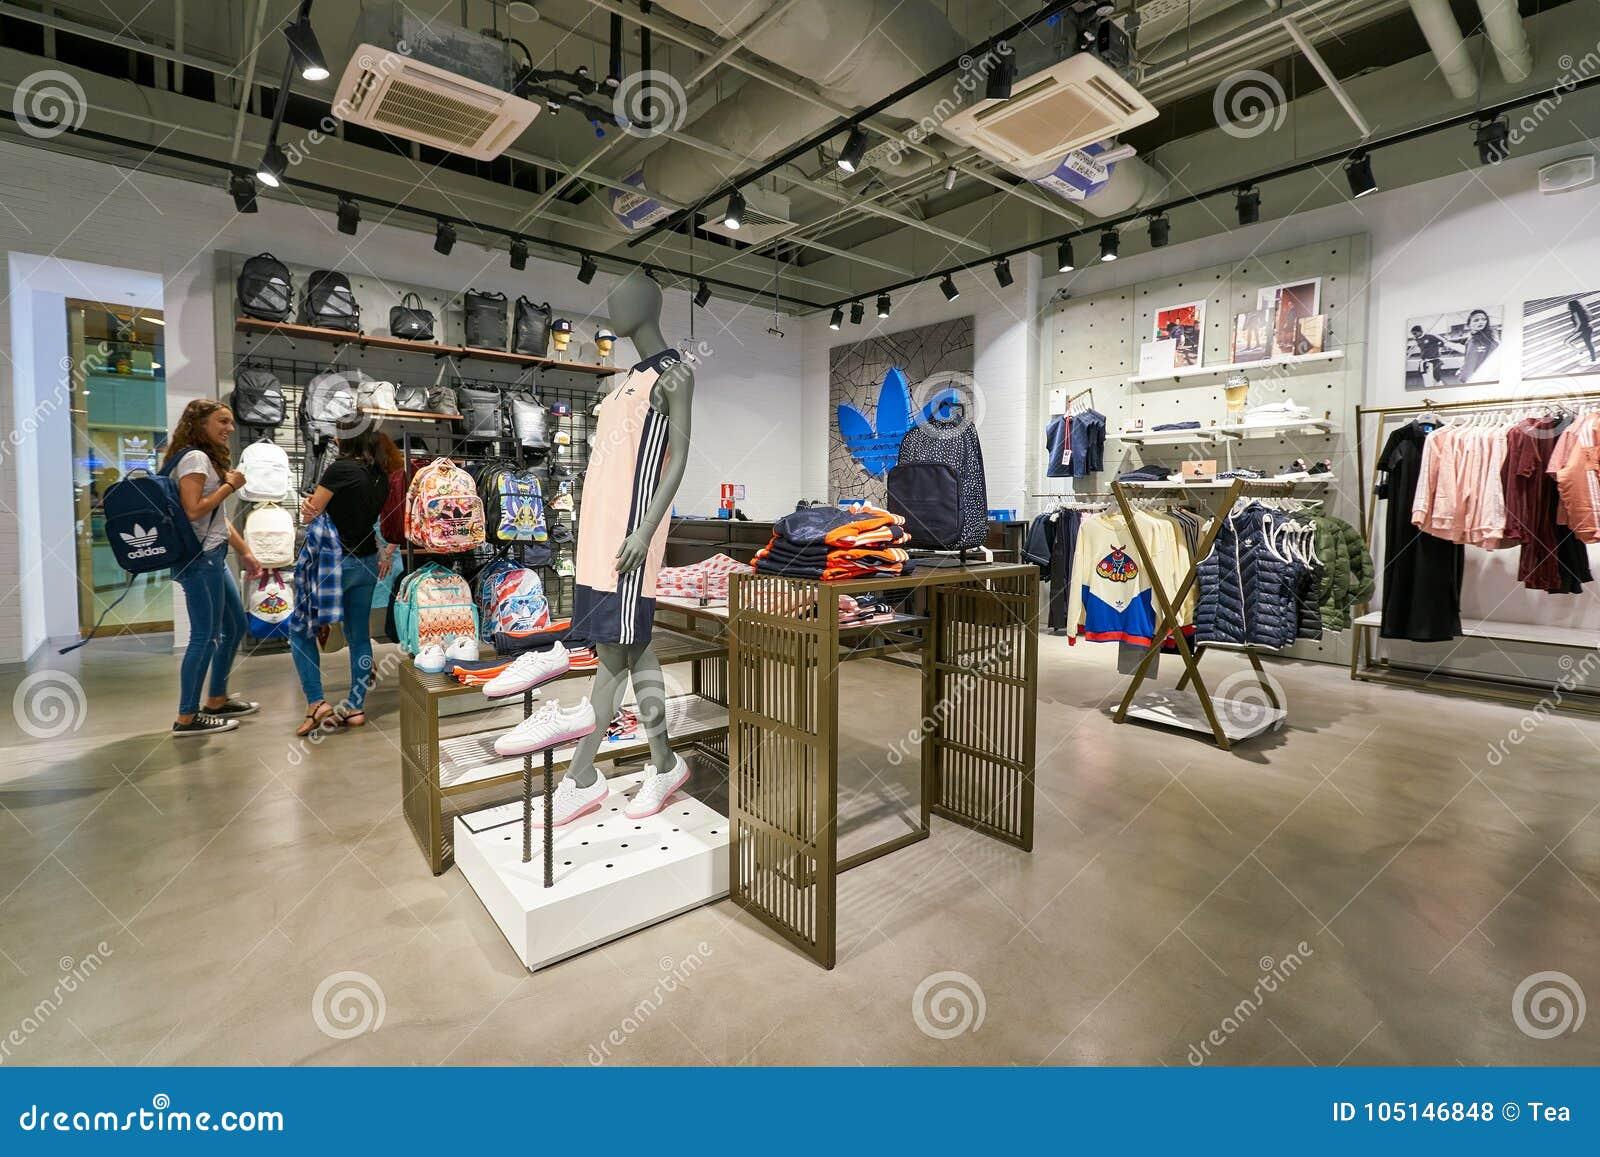 adidas shopping